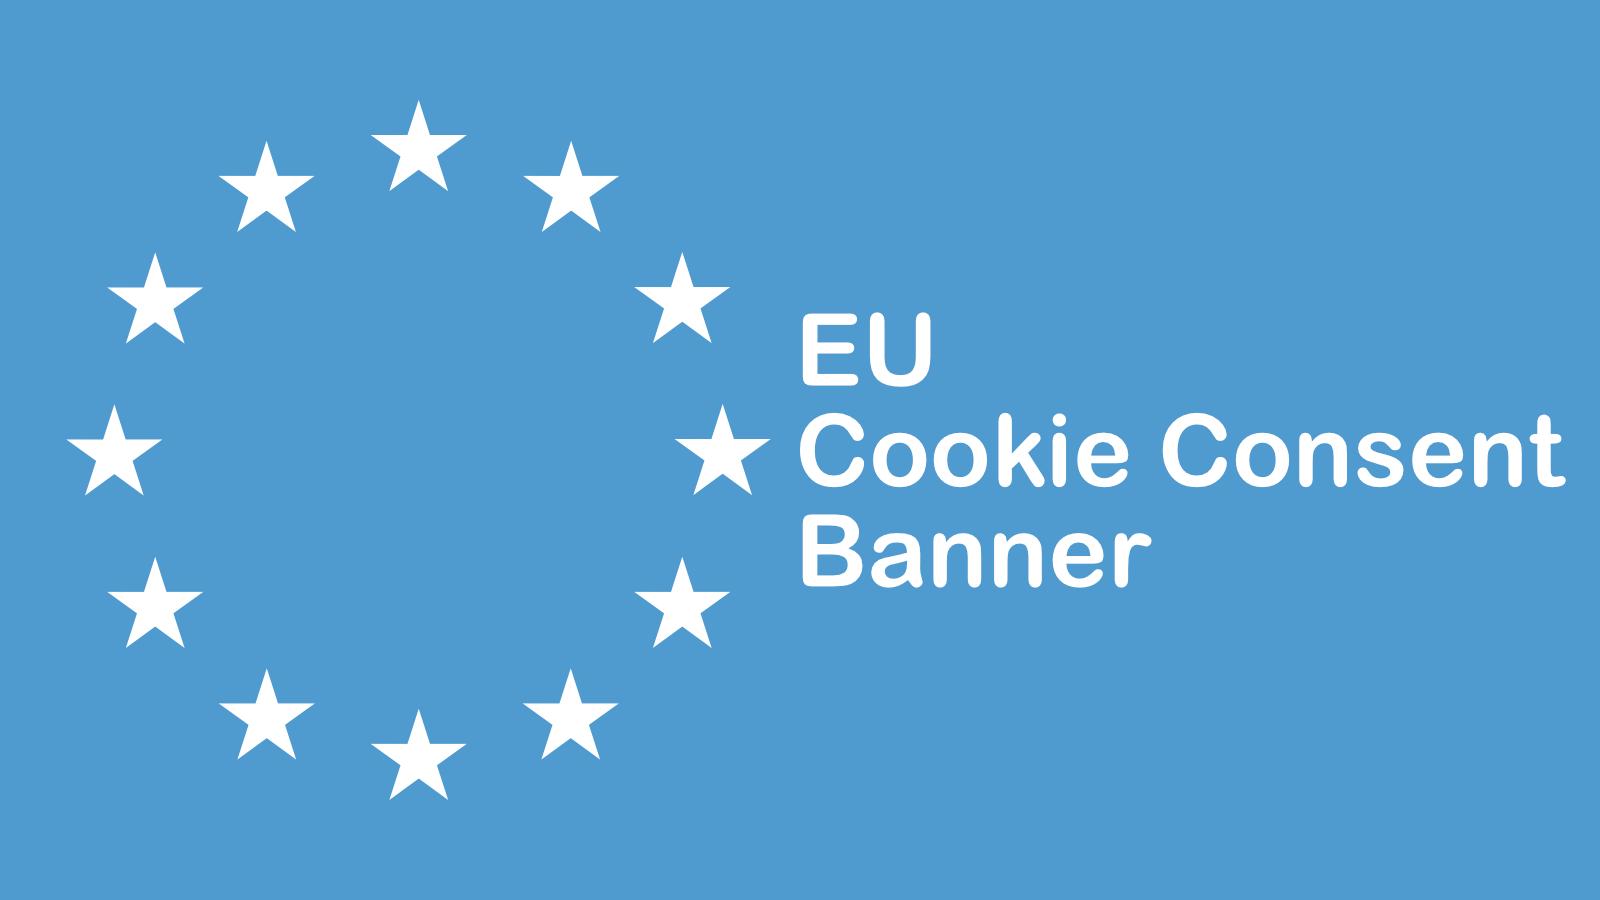 Shopify App: EU Cookie Consent Banner